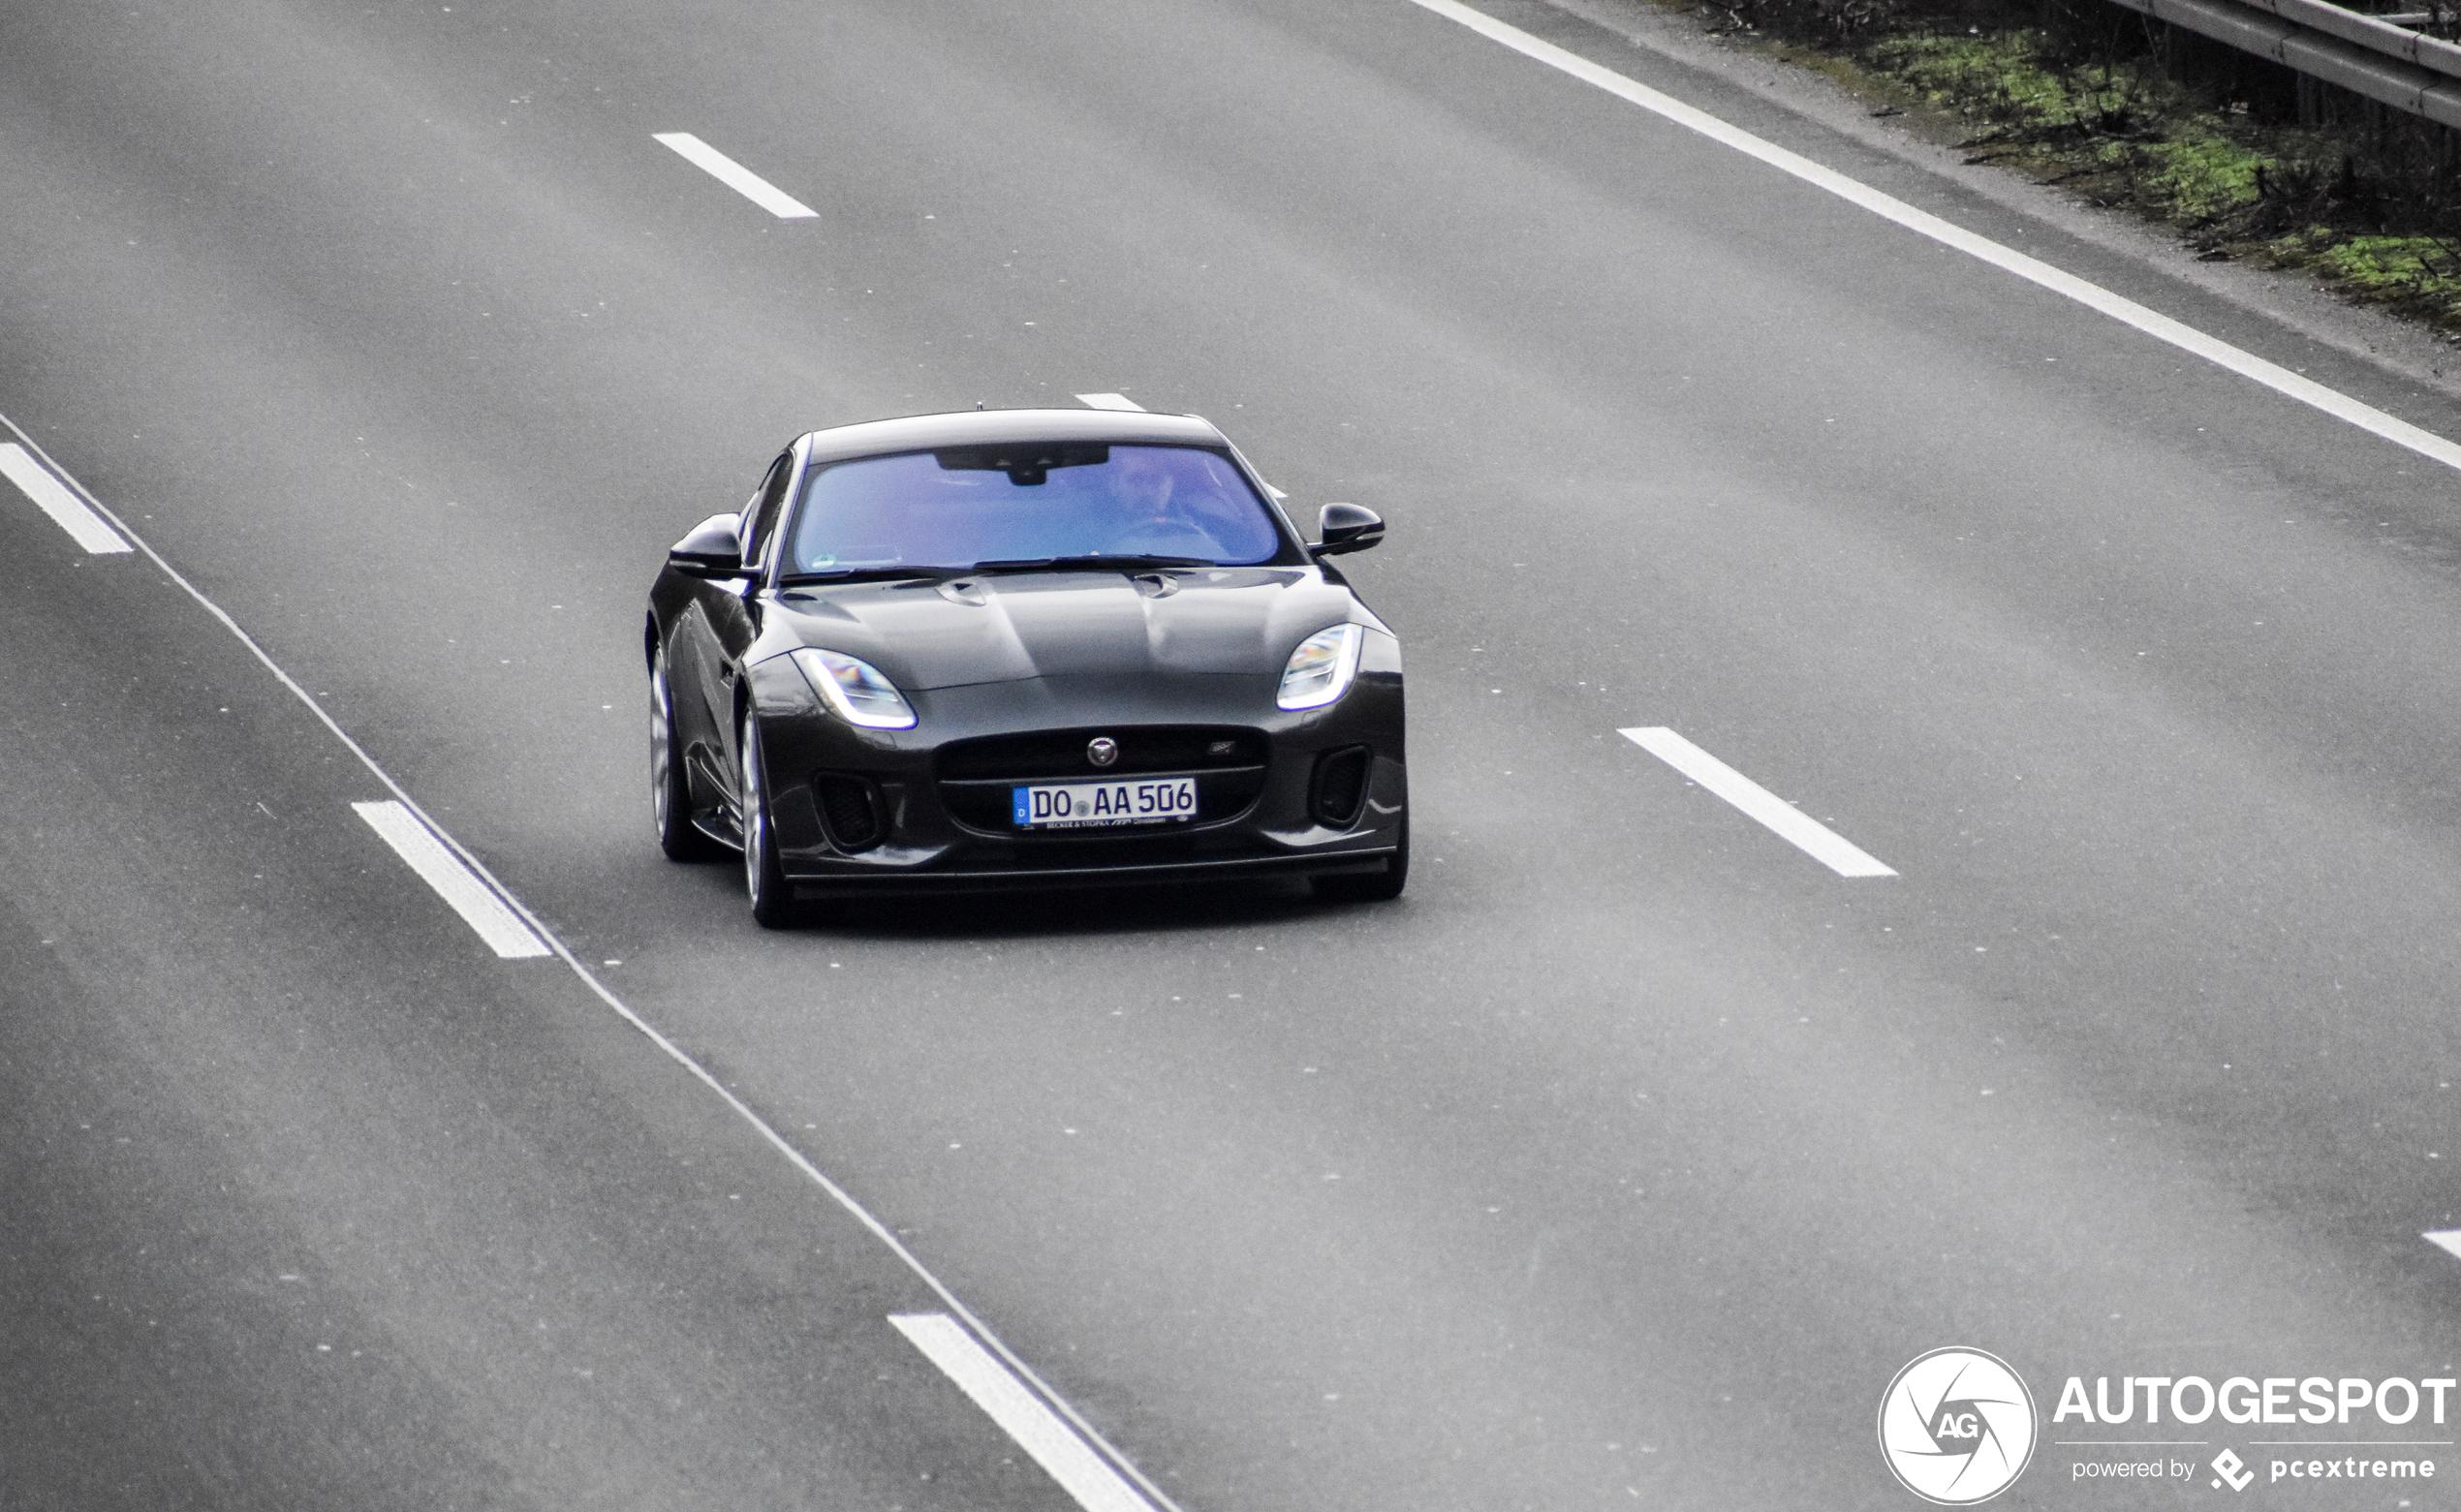 Jaguar F-TYPE S Coupé Chequered Flag Edition 2019